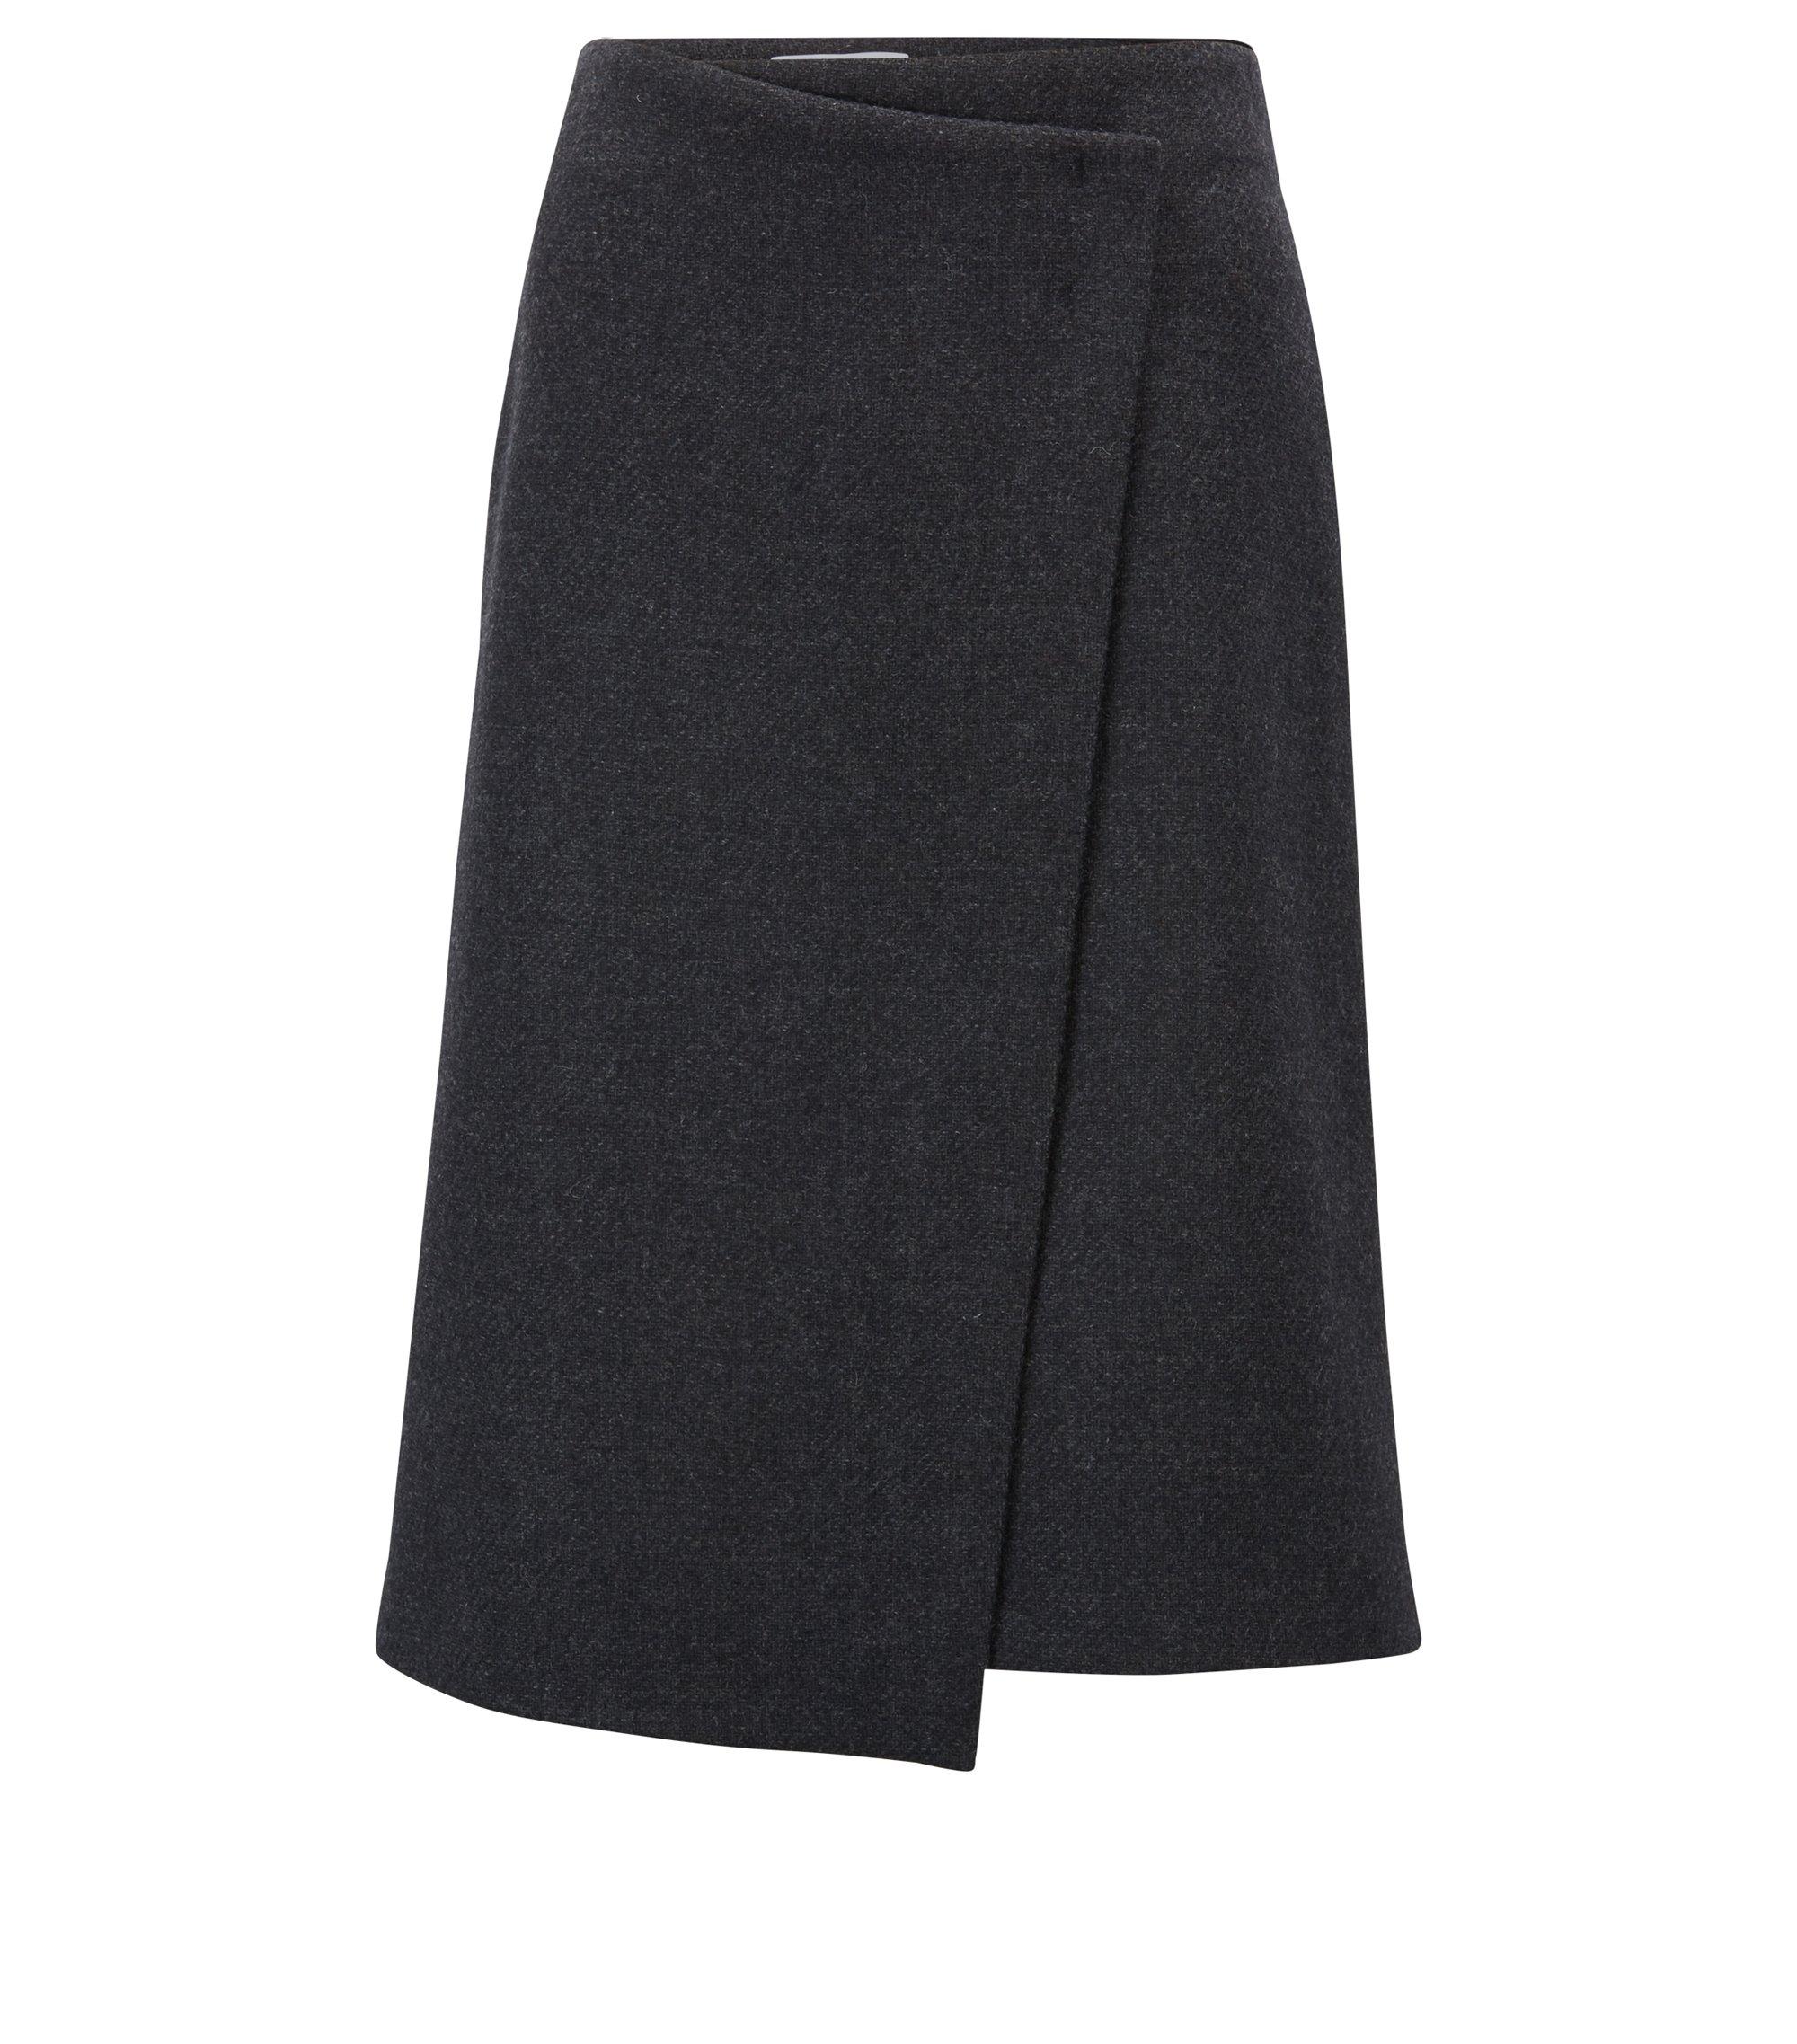 Falda cruzada en mezcla de lana italiana con detalle de puntadas de remate, Negro